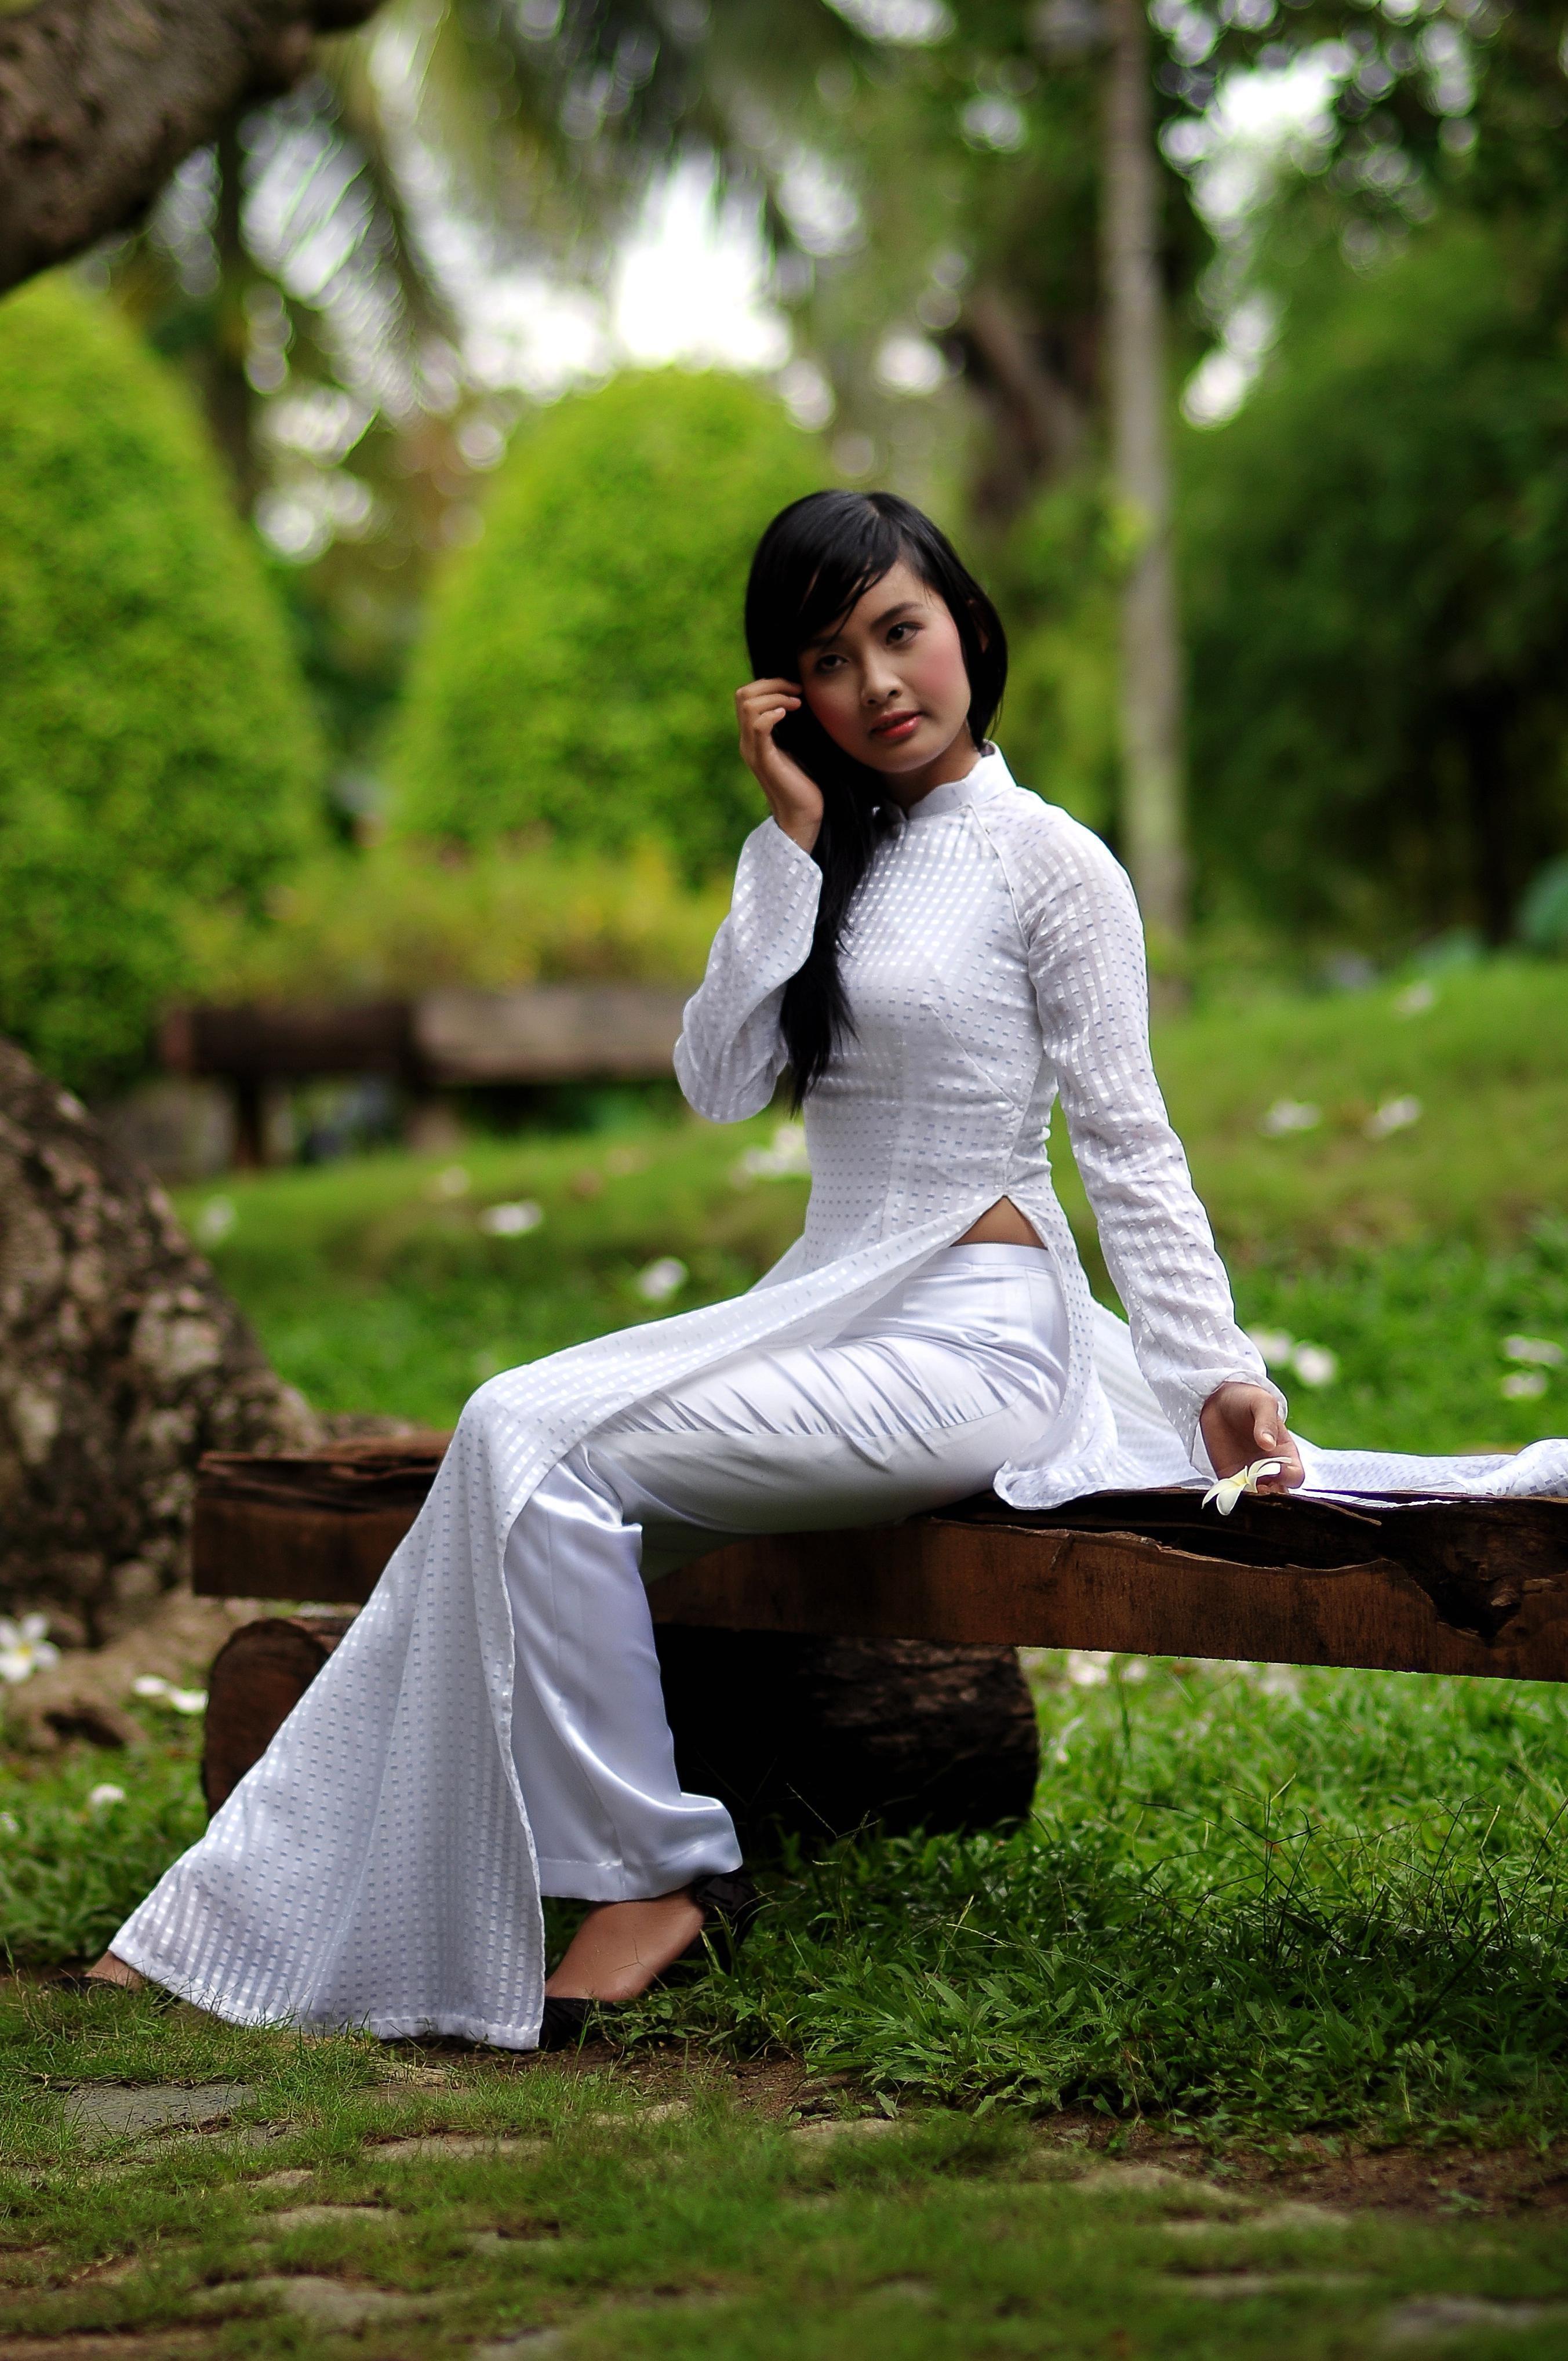 Free picture: nature, woman, grass, pretty girl, Asia